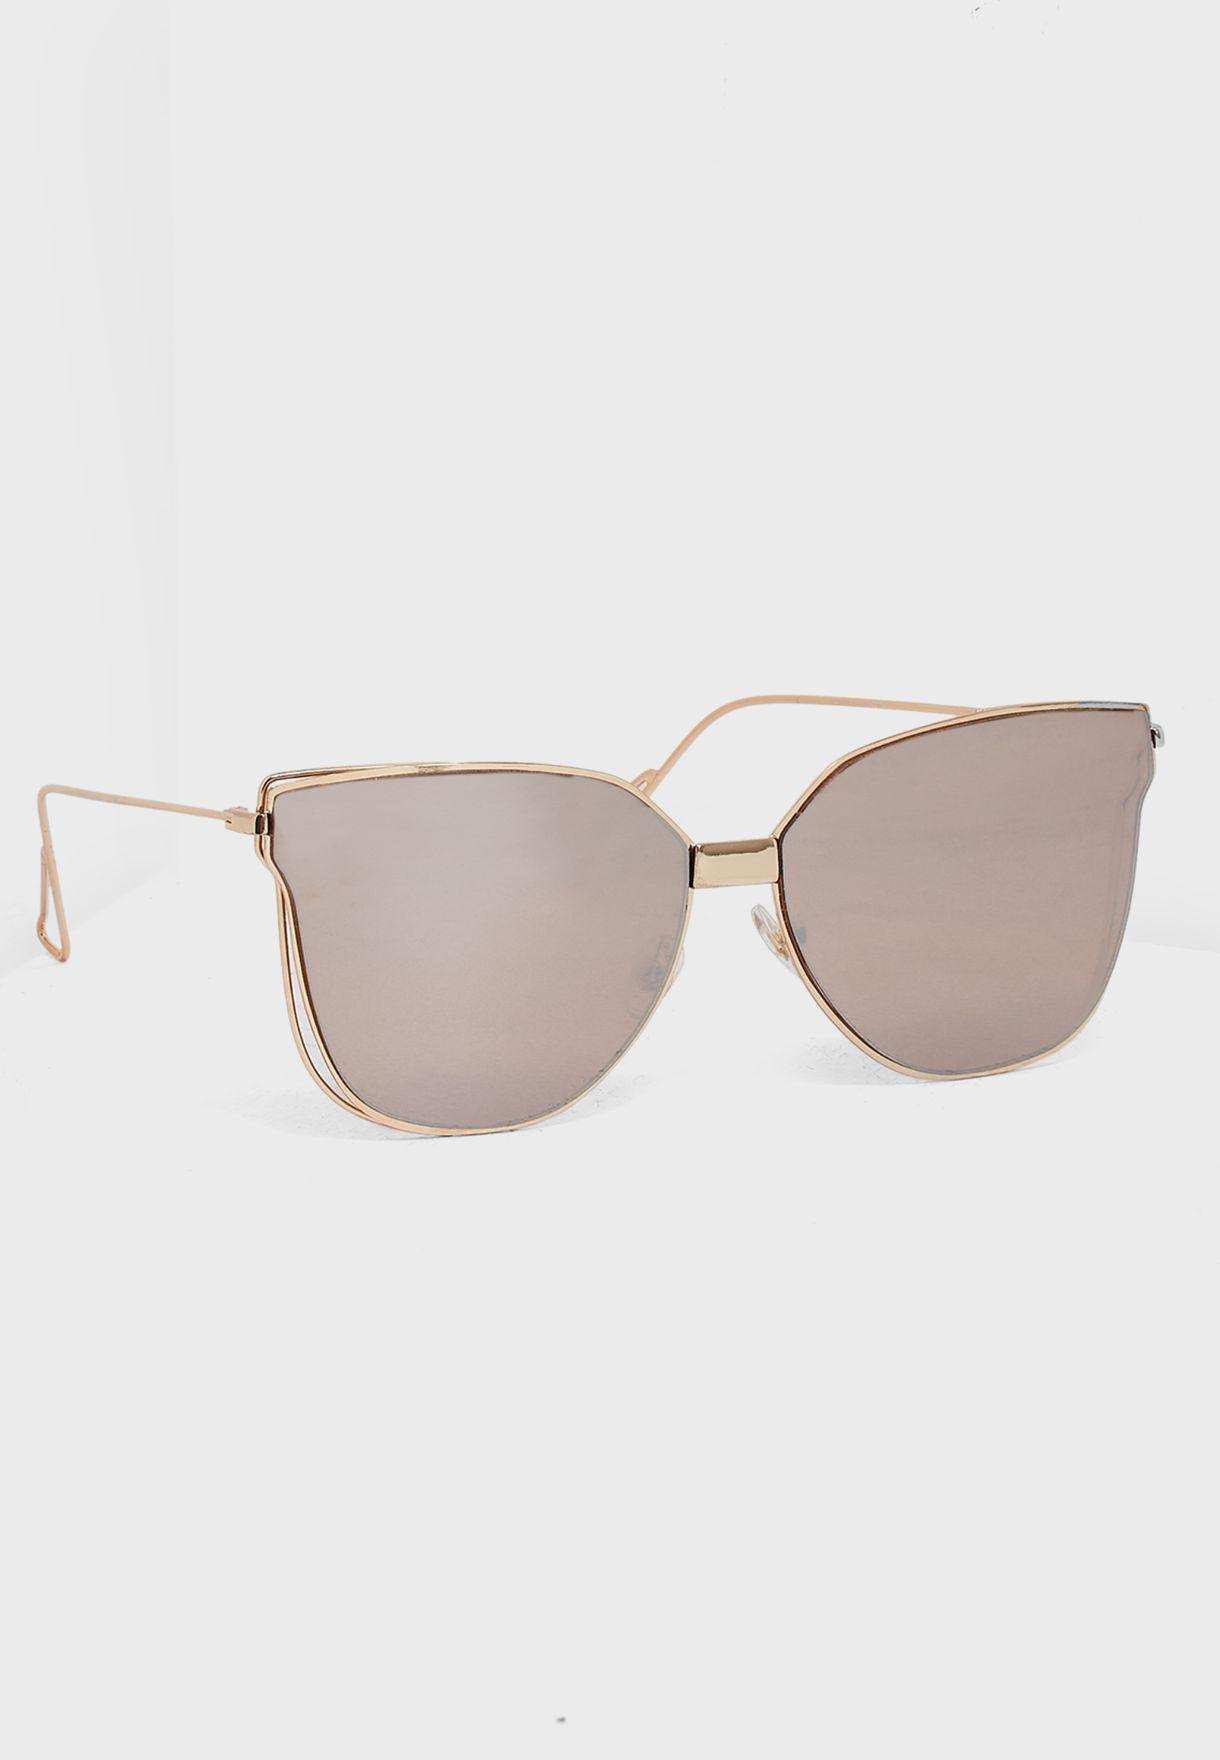 26e4f2626a4 Shop South beach gold Cat Eye Flat Lens Sunglasses 4-FL-800RSE for ...